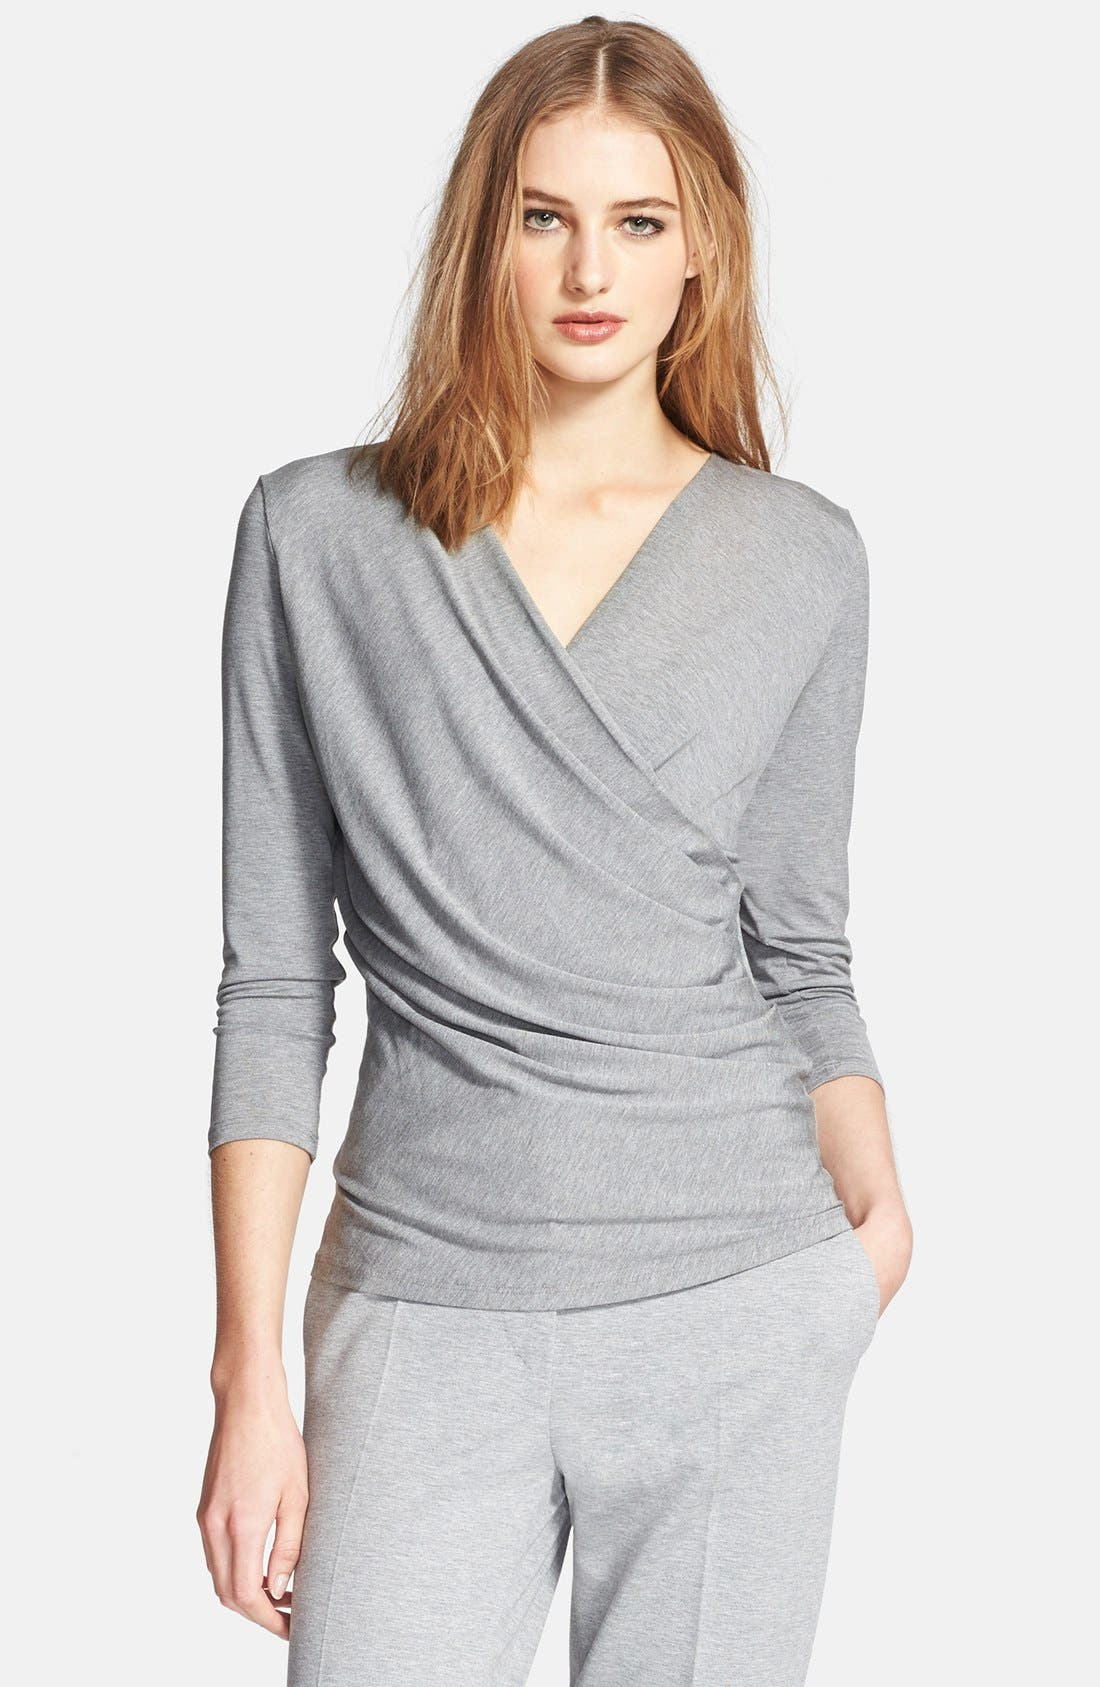 Alternate Image 1 Selected - Max Mara 'Caprice' Faux Wrap Jersey Top